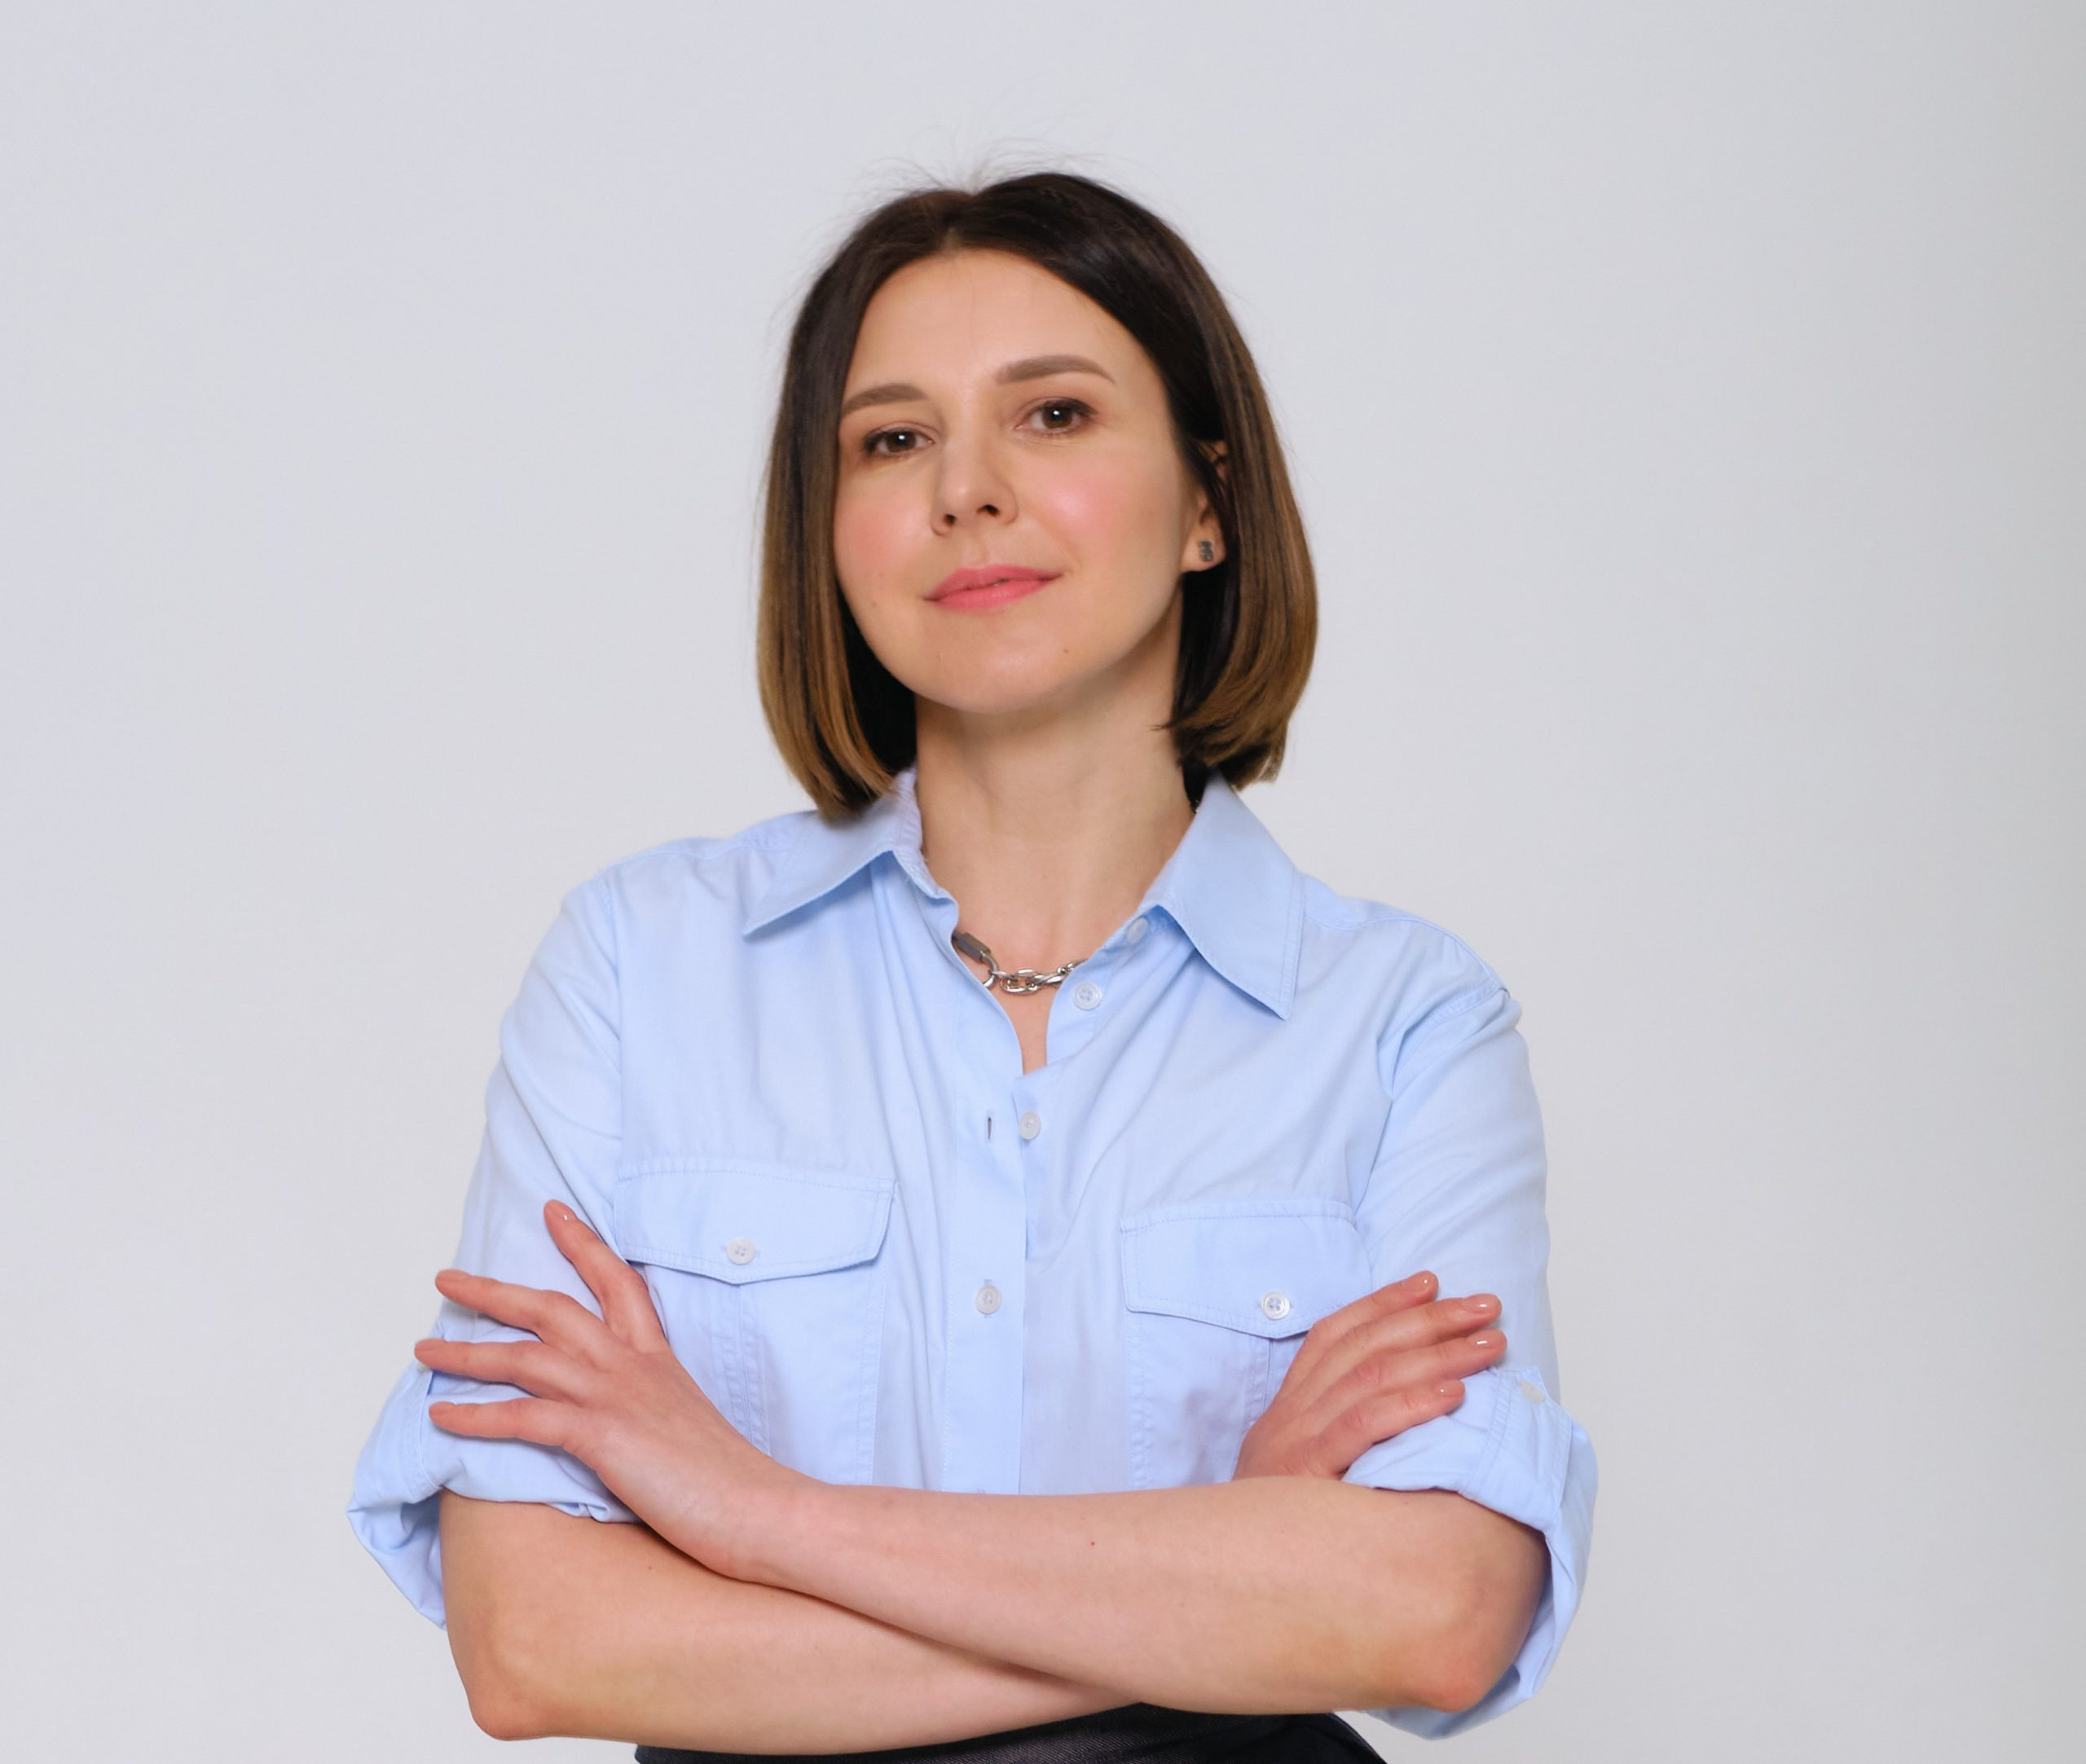 Анастасия Байдаченко, СЕО IAB Ukraine